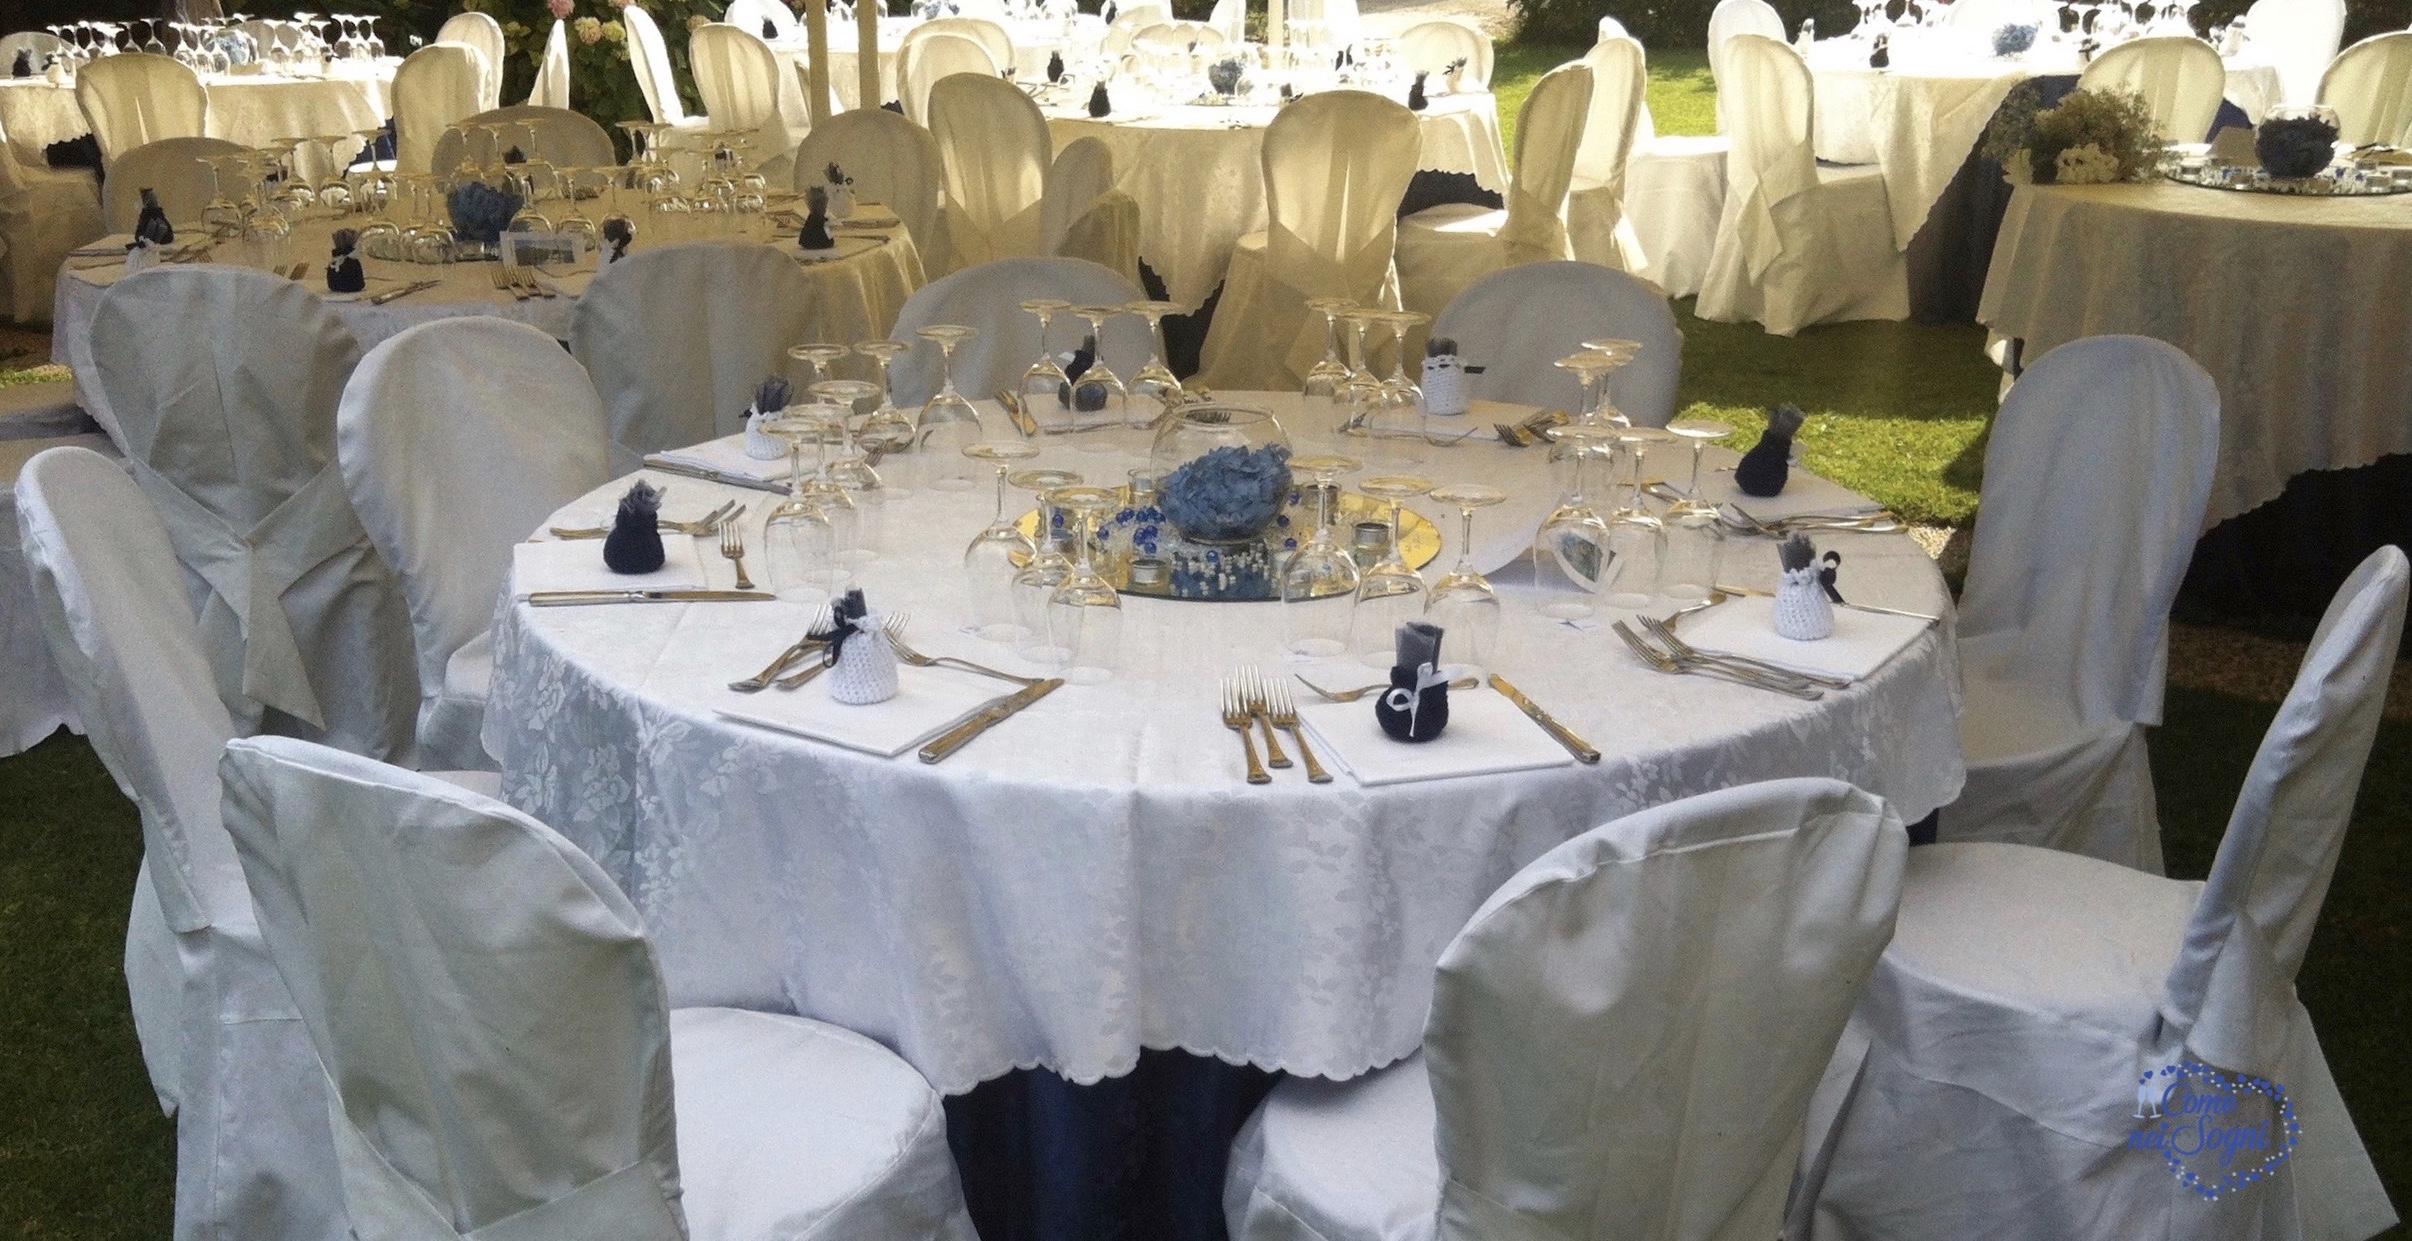 Ricevimento nuziale: scelta dei tavoli